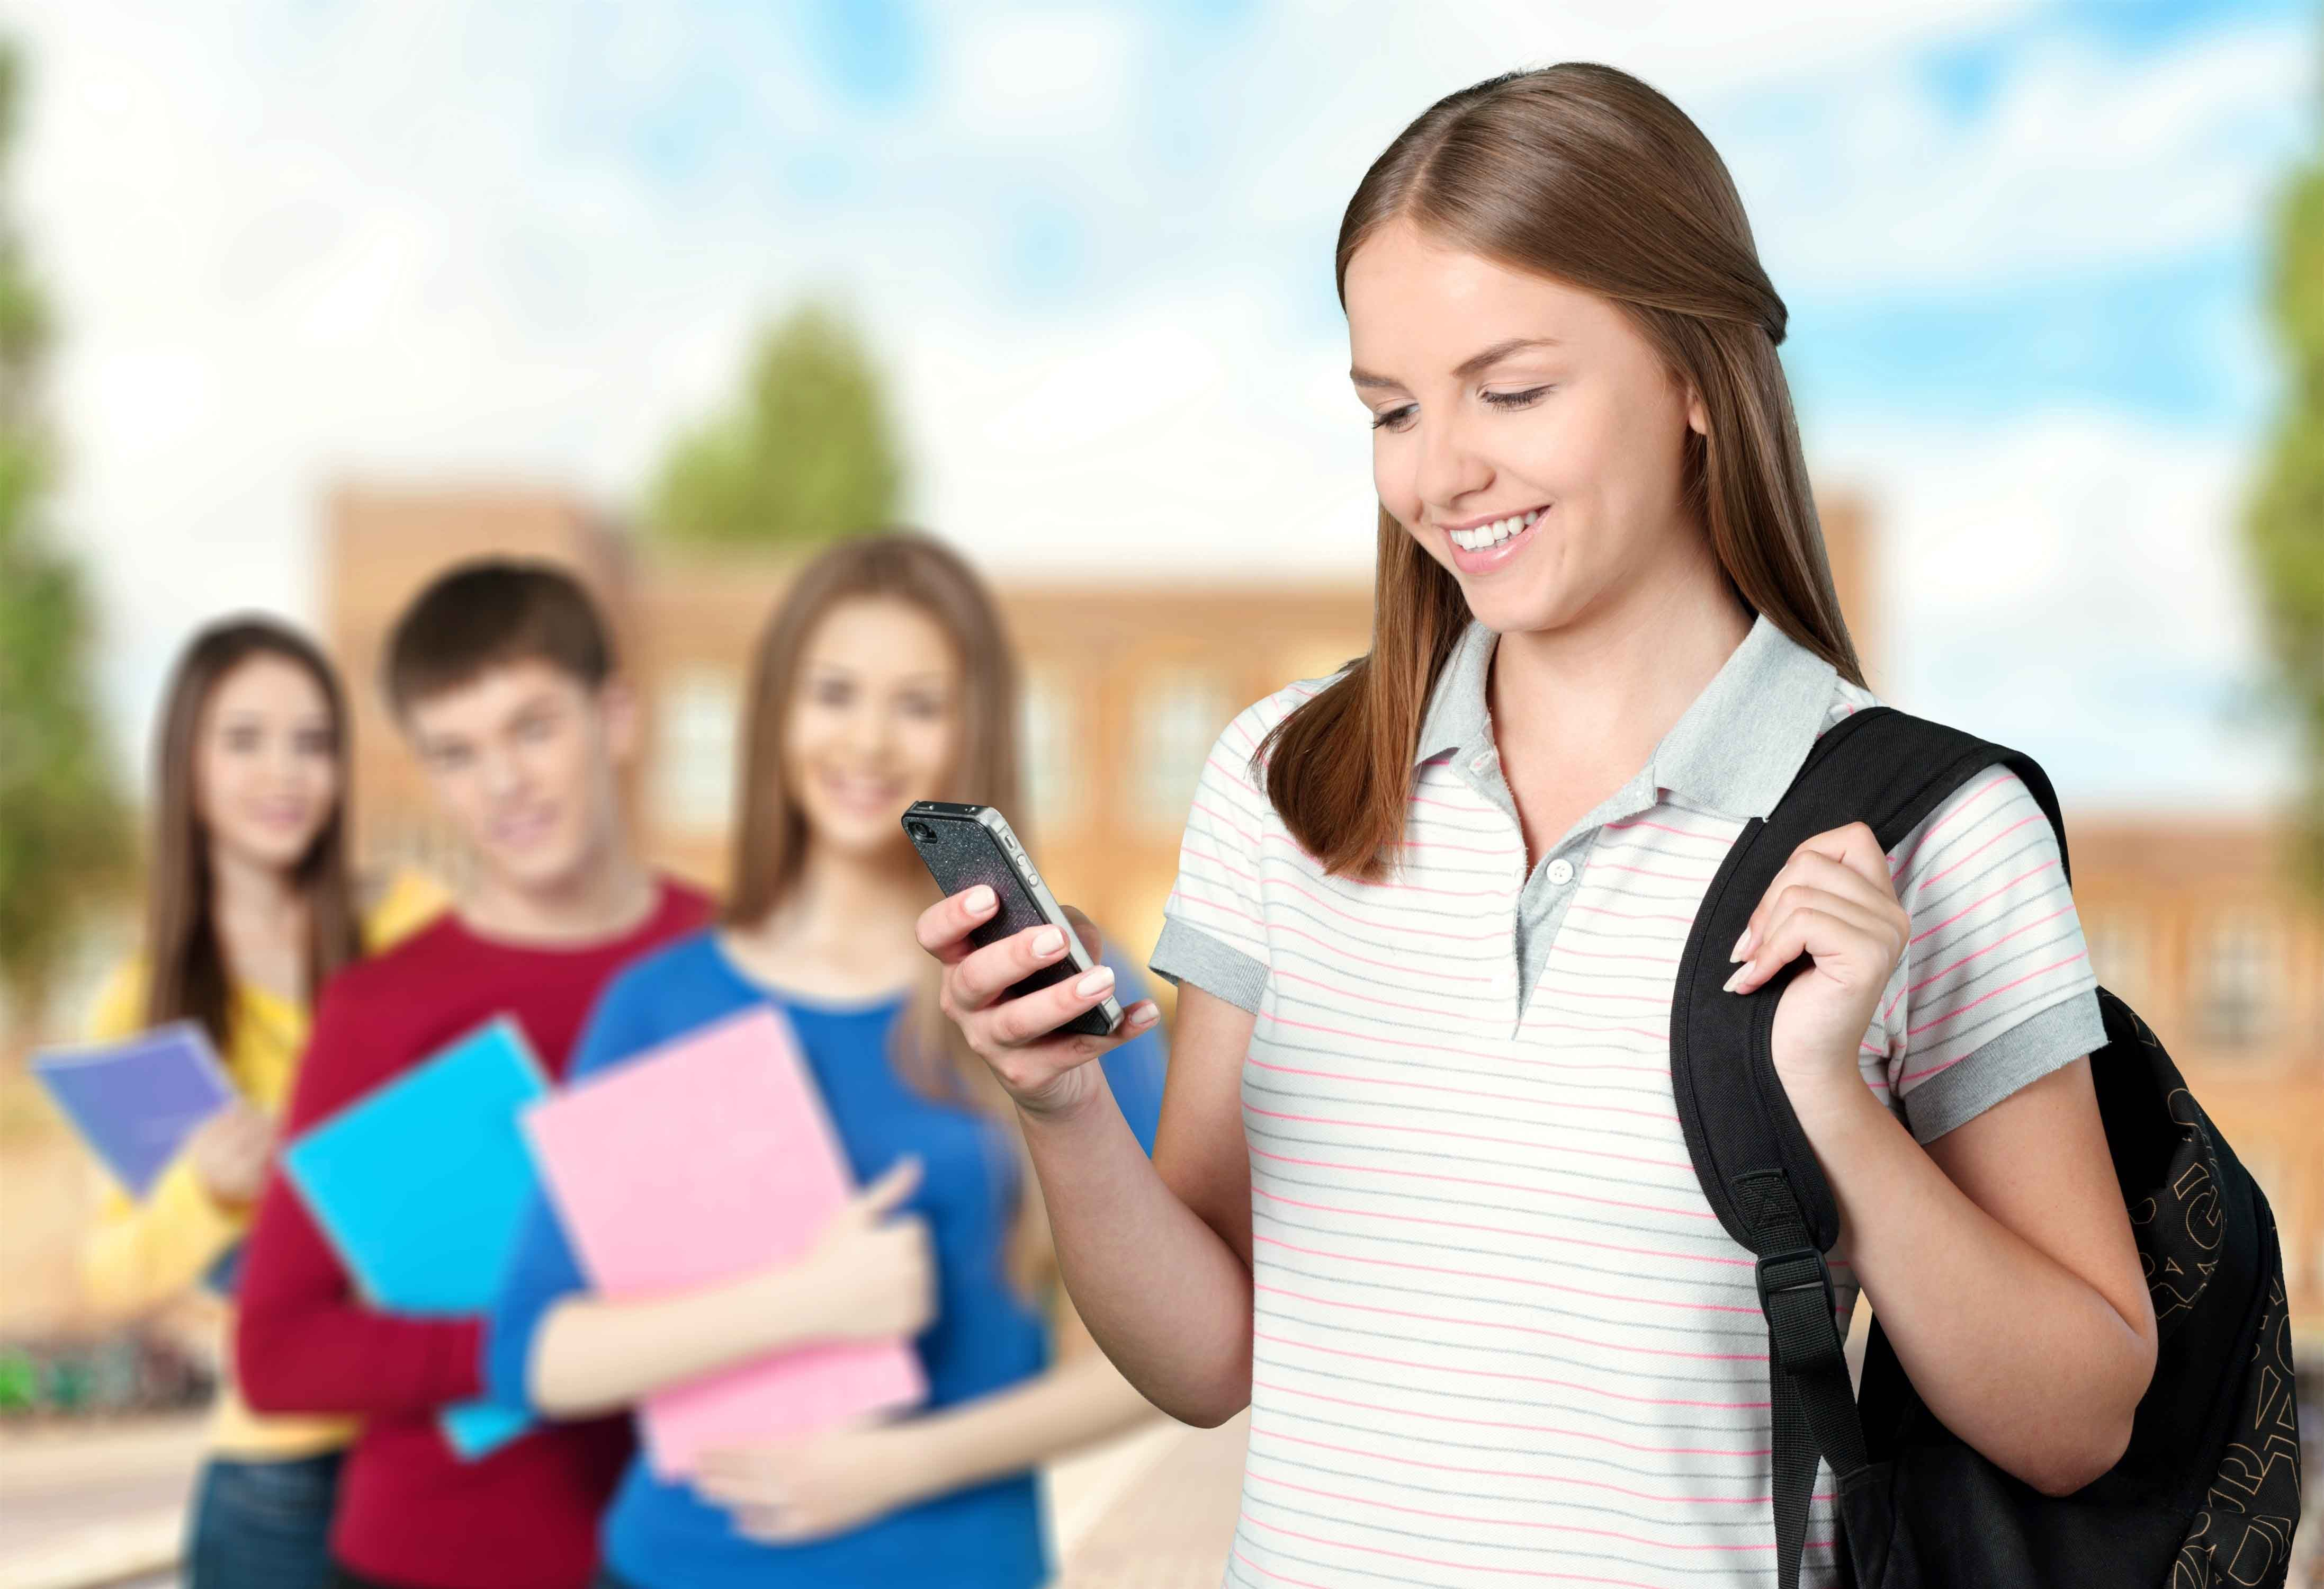 UA-PTC student on her mobile device